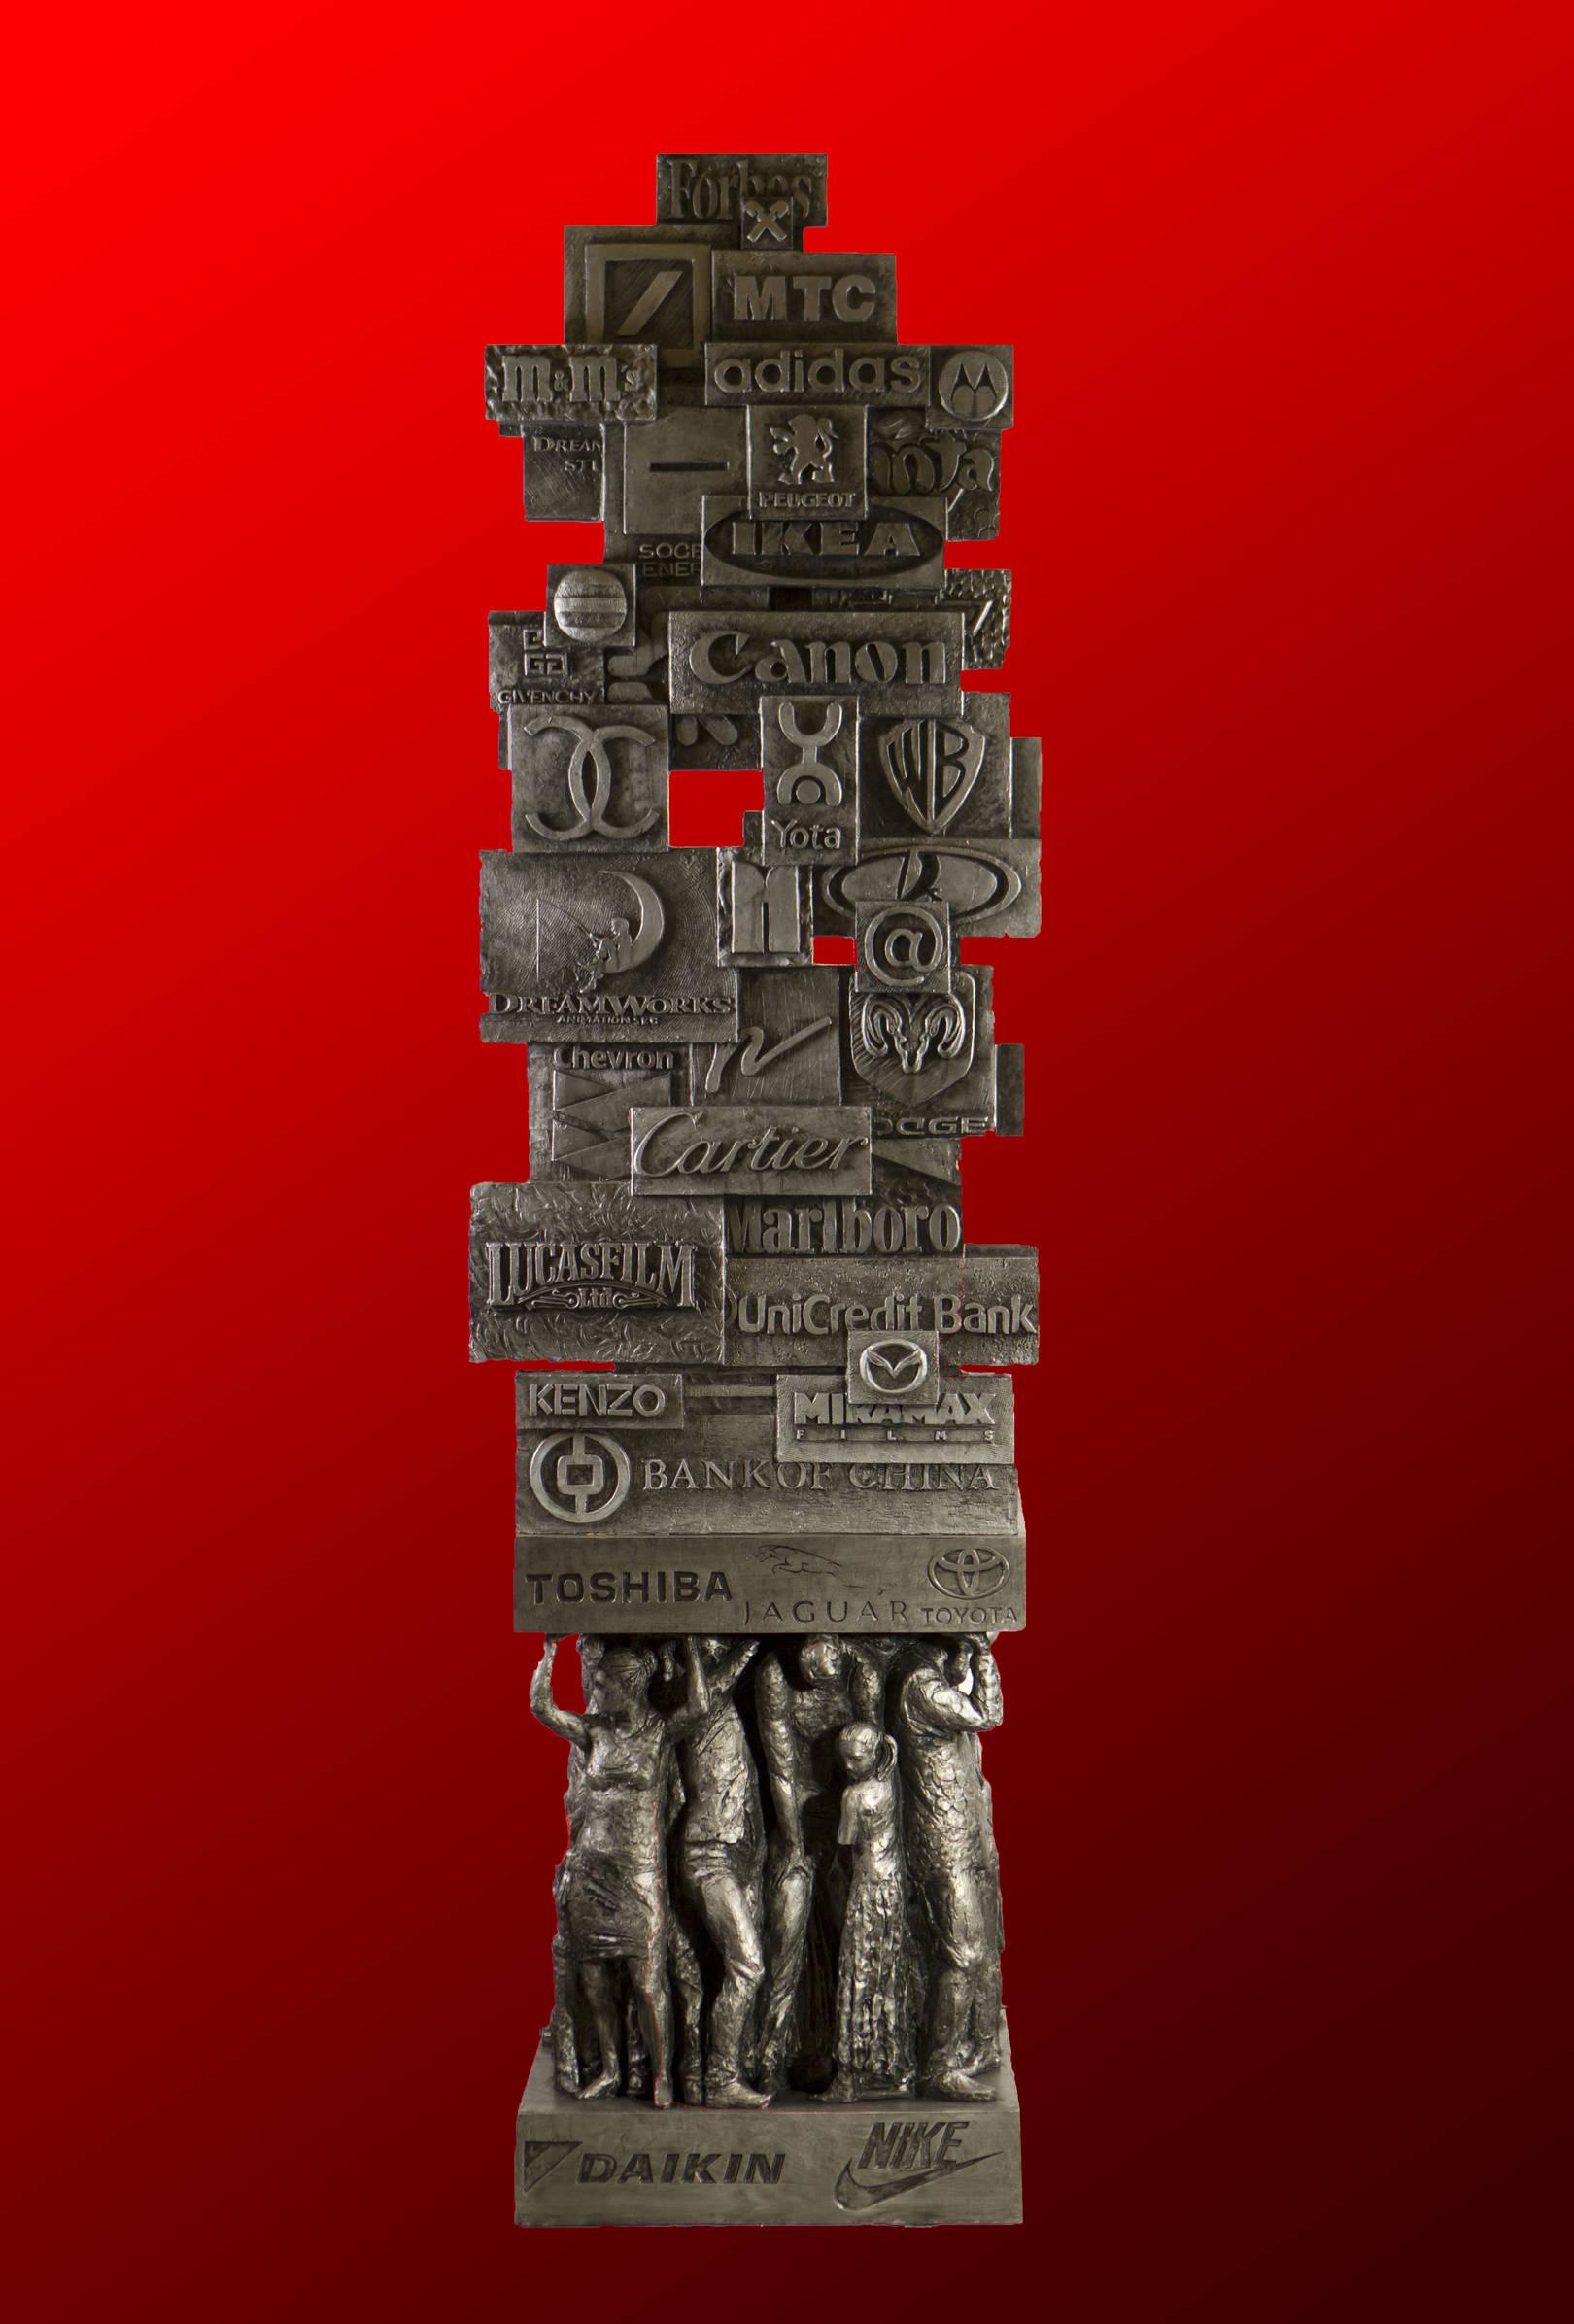 "The throne. Modern sculpture ""the Throne of Mankind"" is one of the five subjects sculptural series created by the author. The series also includes: ""the Totem pole of all religions"", ""the Obelisk of freedom"", ""the Sarcophagus of Humanity"", ""Modern icon"". This philosophical series of sculptures was created by the author as the judgment of this moment, which came up humanity. This sculpture is a panegyric to the society of consumption, which will no doubt take place is the firm belief of the author. The throne is like a sculpture Park, and the piece of furniture. It is universal in its application. Трон. Современная скульптура «Трон Человечества» - один из пяти предметов скульптурной серии, созданной автором. В серию также входят: «Тотемный столб всех религий», «Обелиск свободы», «Саркофаг Человечества», «Современная икона». Эта философская серия скульптур создавалась автором как осмысление данного момента, к которому подошло человечество. Эта скульптура является панегириком обществу потребления, время которого, несомненно, пройдет – это твердое убеждение автора. Трон является как парковой скульптурой, так и предметом интерьера. Он универсален в своем применении."